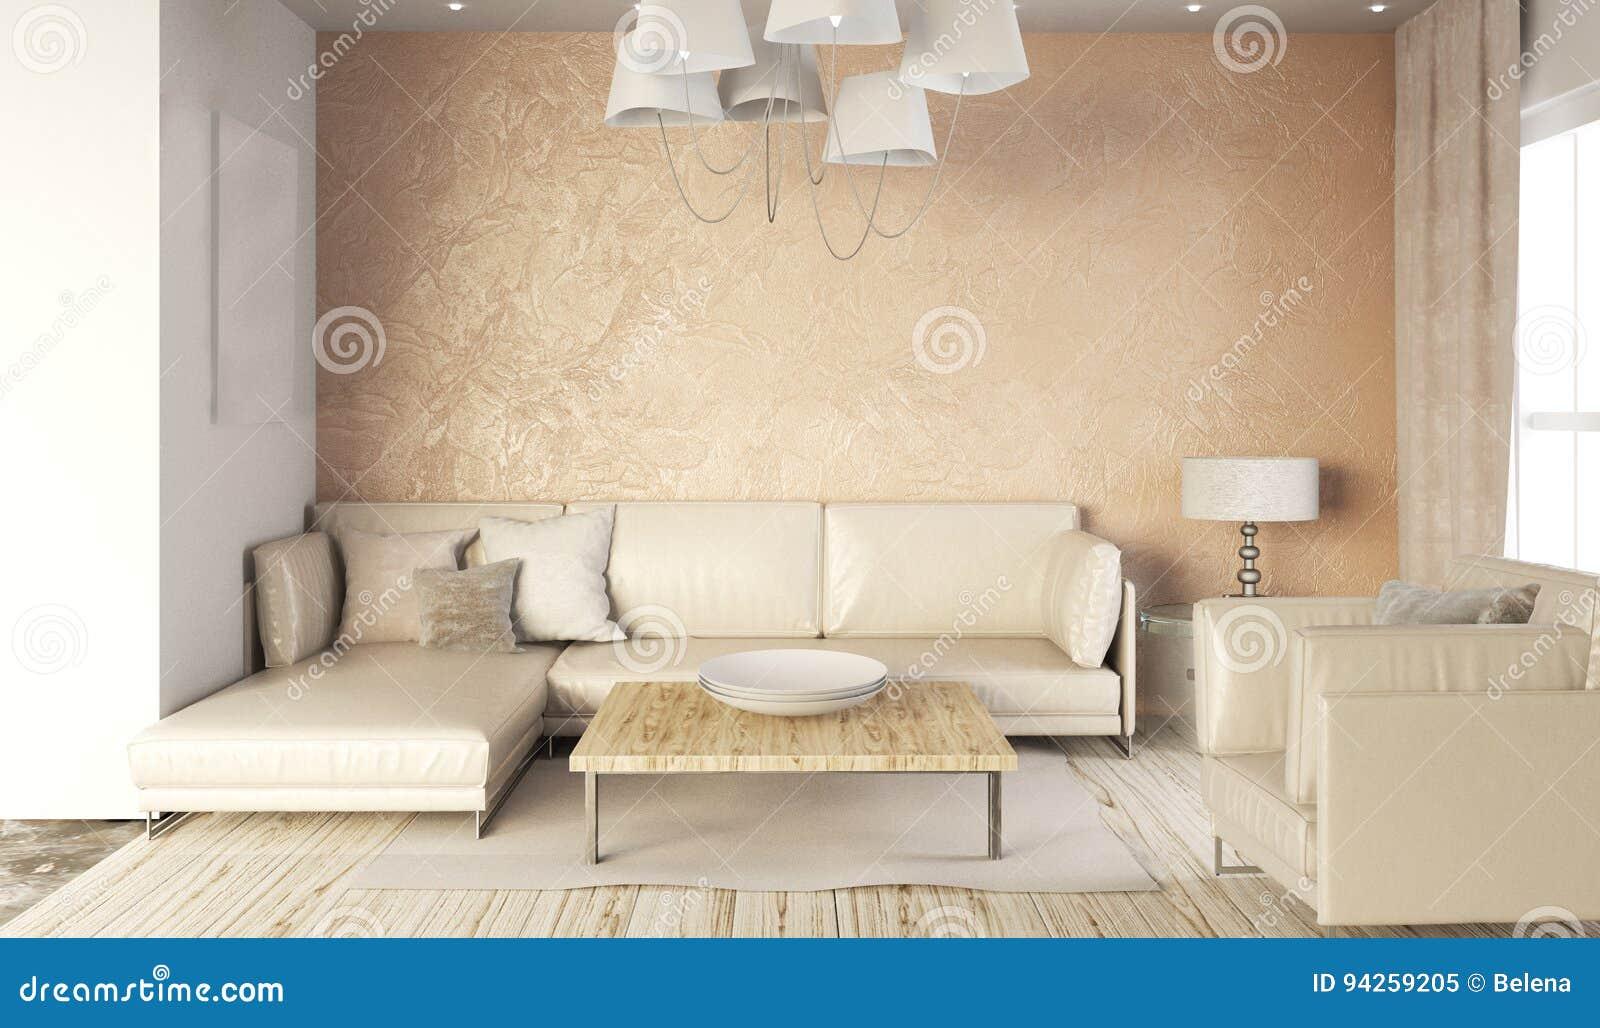 https://thumbs.dreamstime.com/z/spot-op-muur-binnenland-met-bank-woonkamer-moderne-stijl-94259205.jpg